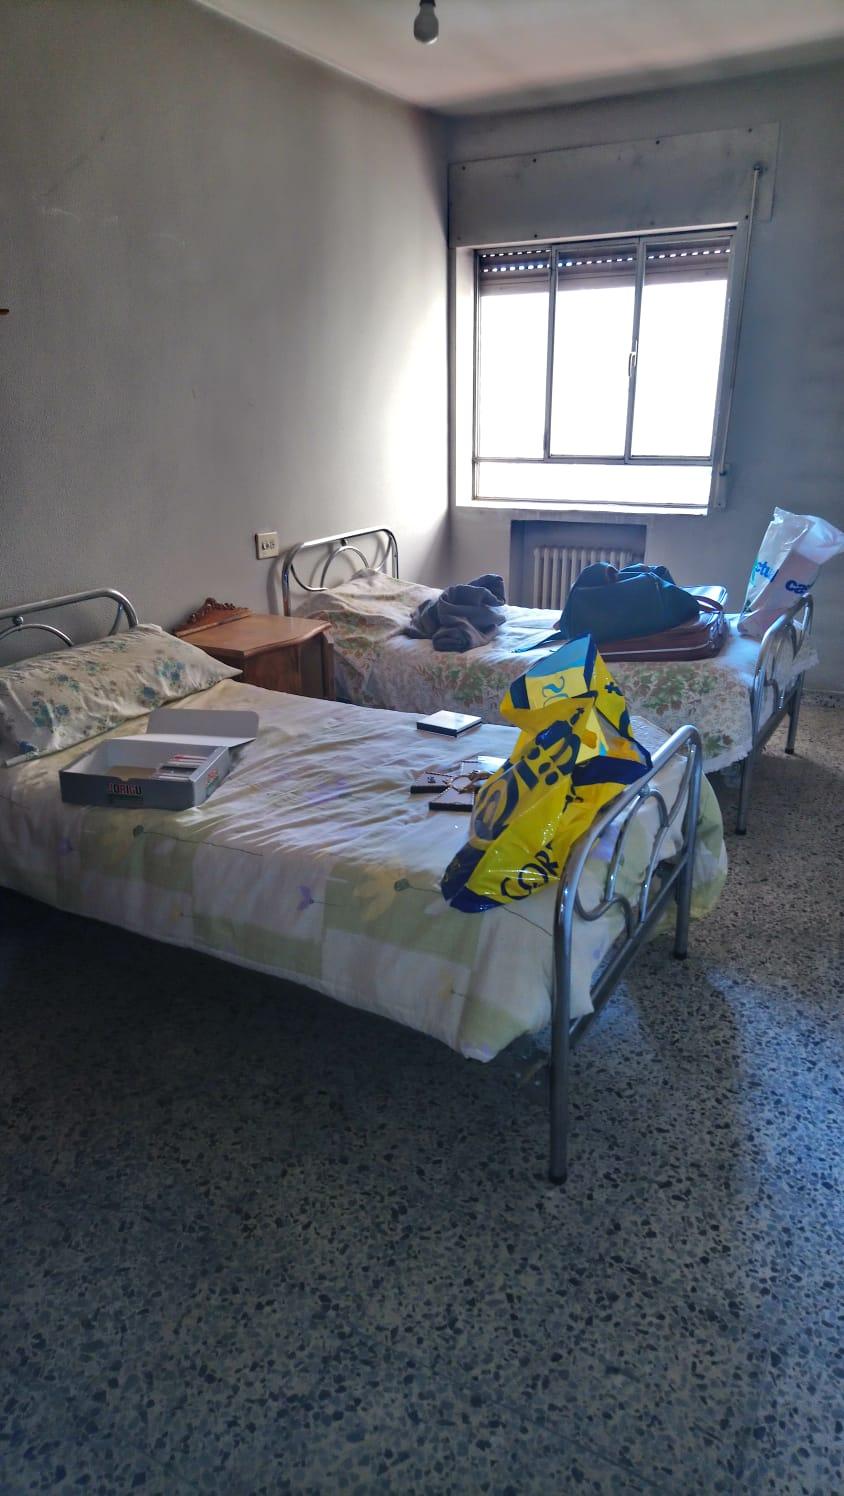 piso en avenida de portugal para refomar (REF: 52) - foto 5 e2043904-e01d-4f2a-8e7b-cf909b959c02.jpg